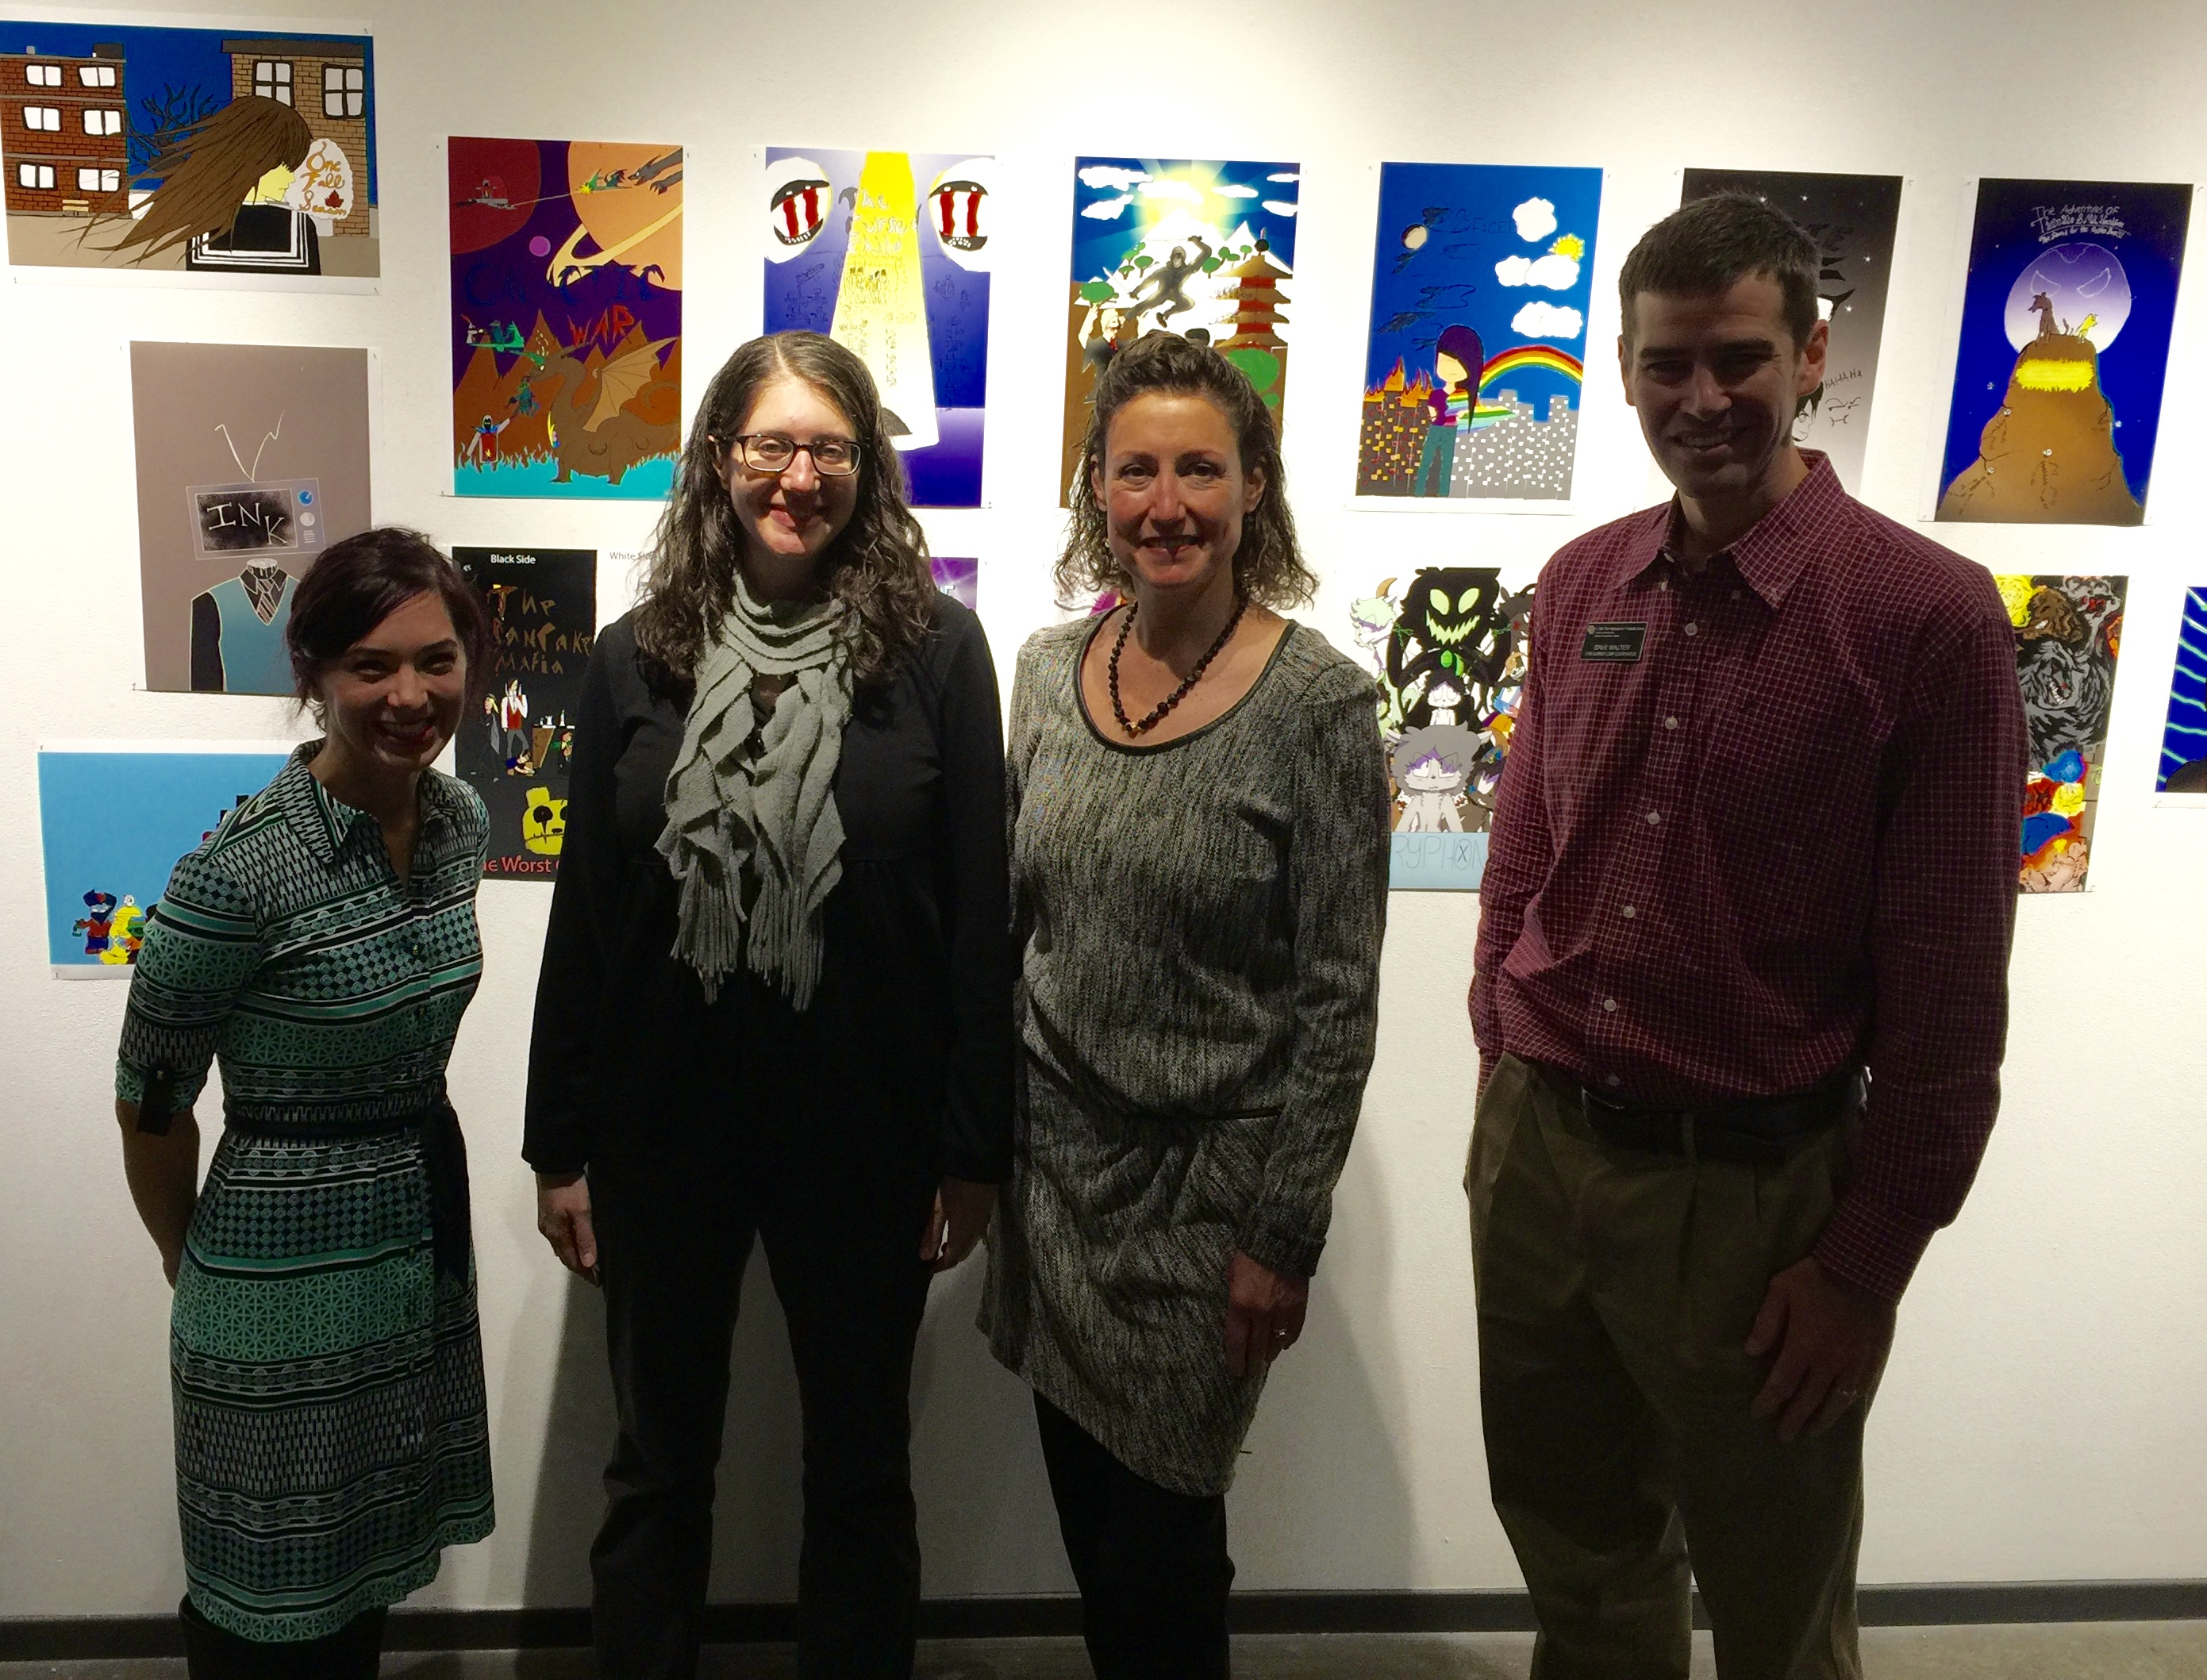 Marianna DiVietro, Sarah Atlas, Antonia Contro, and Dave Walter